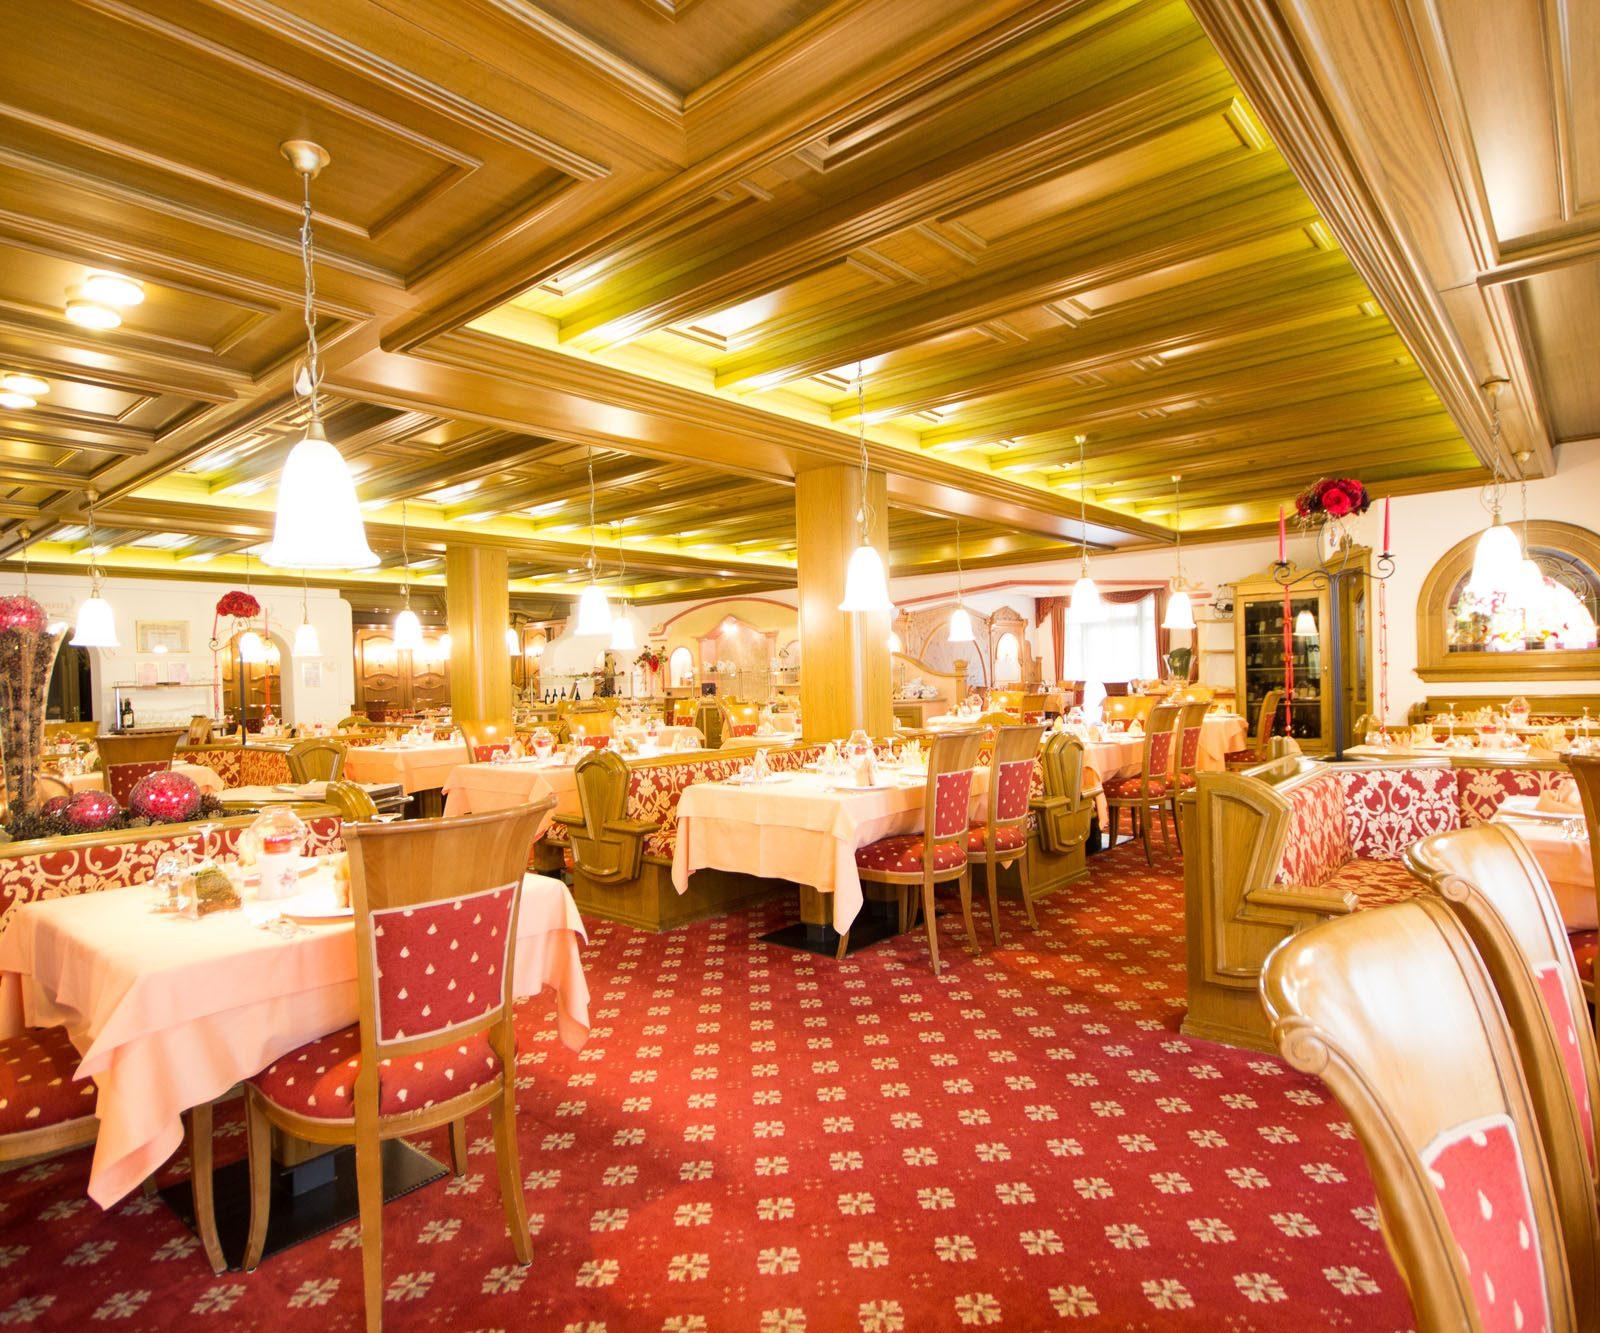 Image for Authentische Gaumenfreuden in unserem Restaurant in Cogolo di Pejo